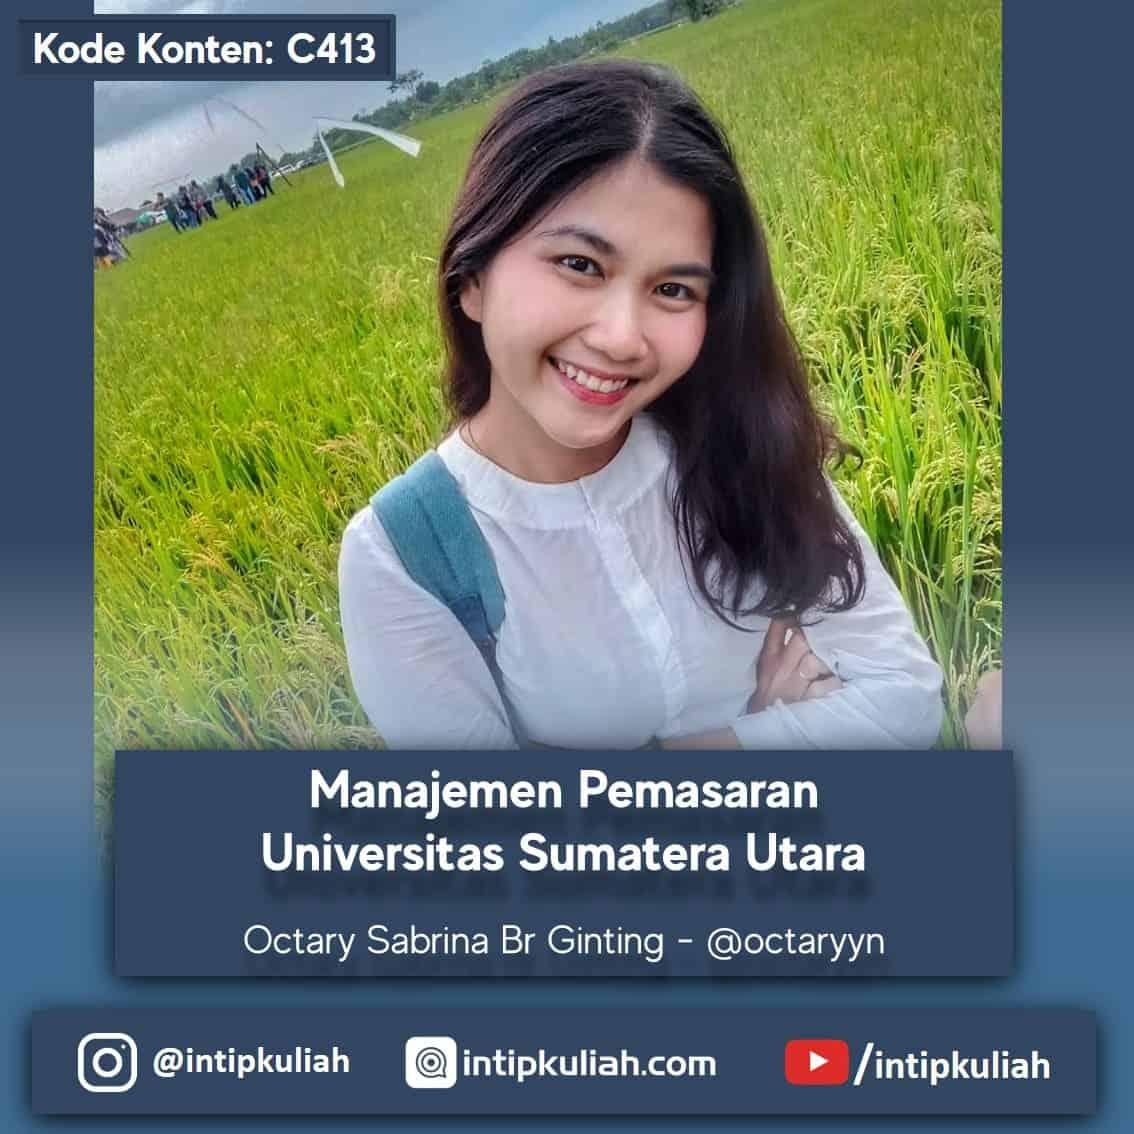 Manajemen Pemasaran Universitas Sumatera Utara (Tary)